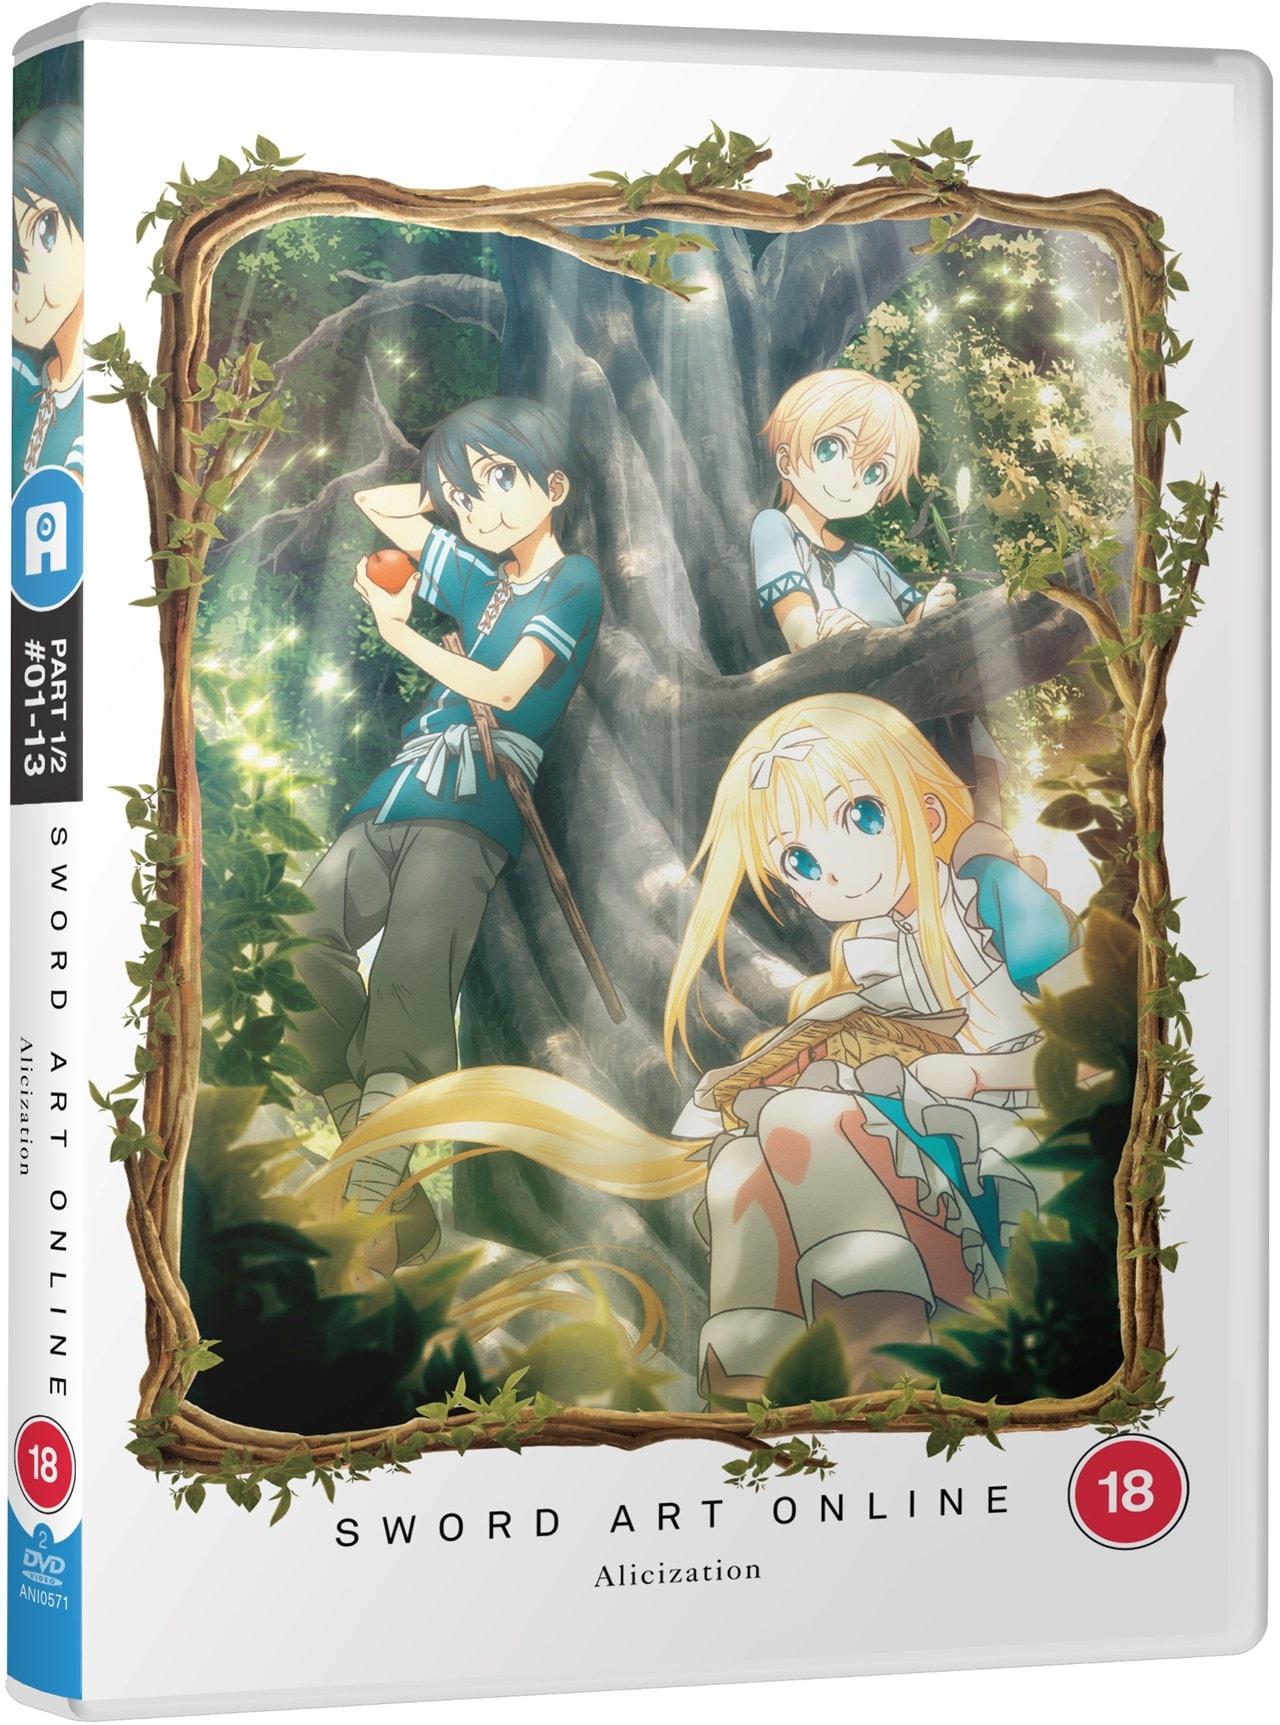 Sword Art Online: Alicization - Part One | DVD | Free shipping over £20 | HMV Store